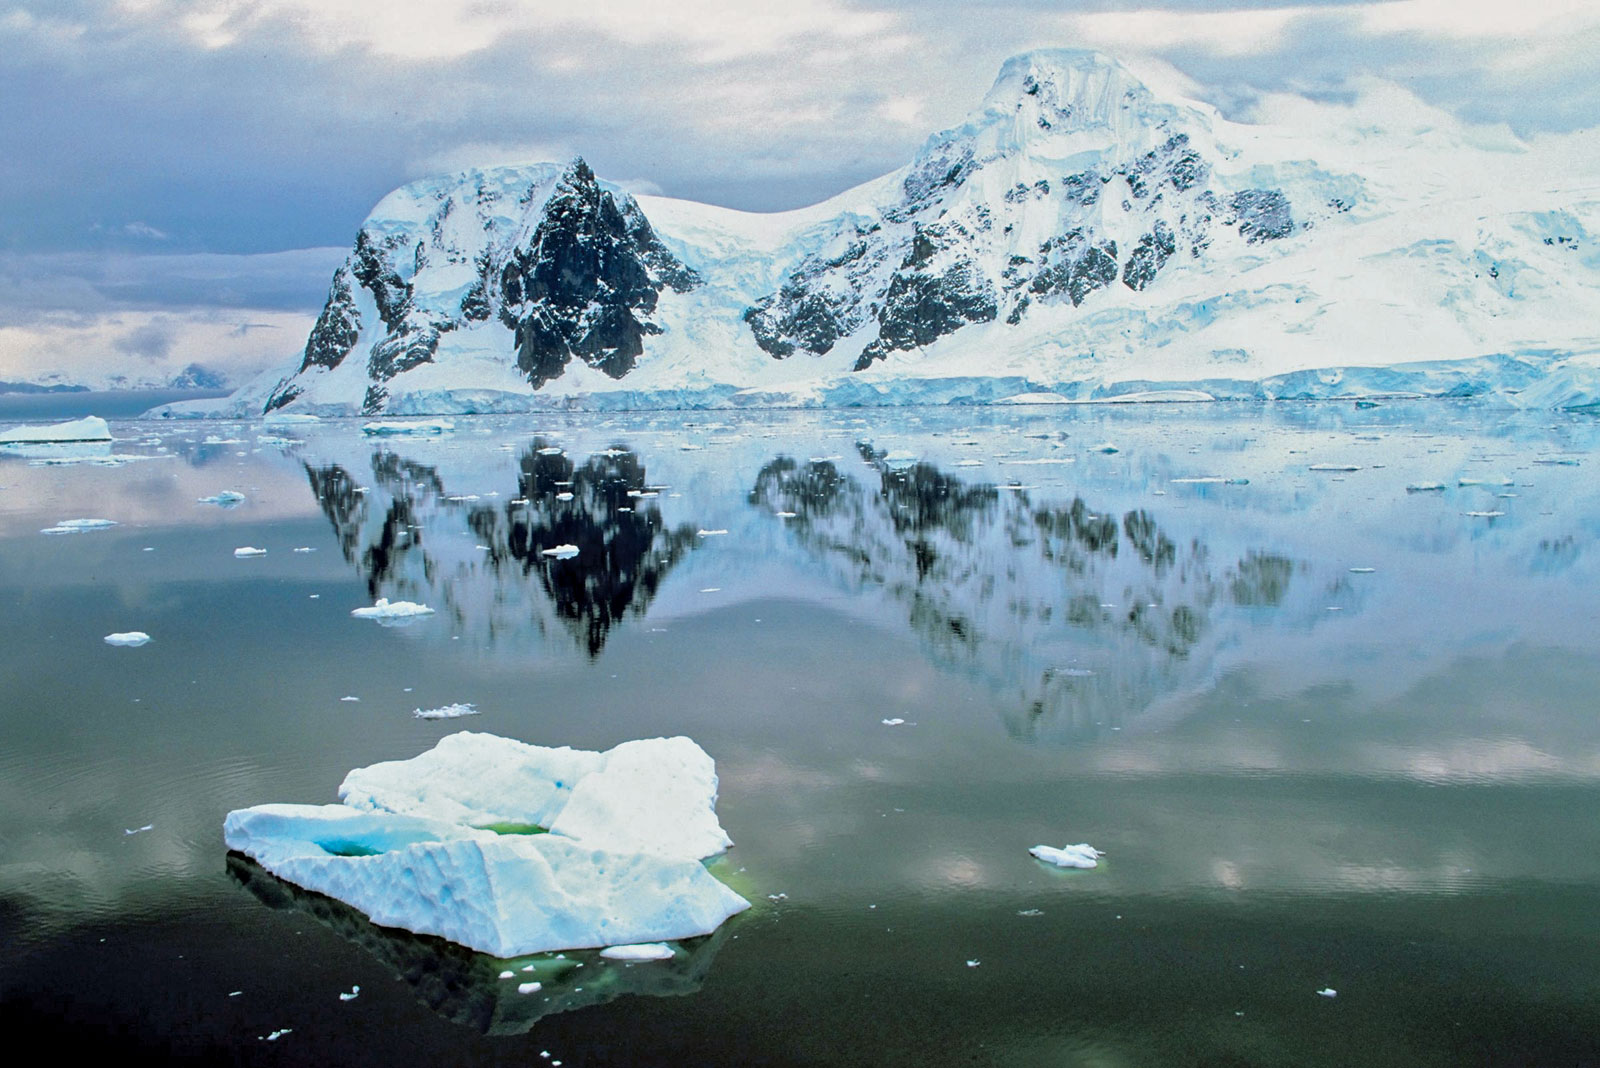 Skrývá se Atlantida pod ledem v Antarktidě? 2